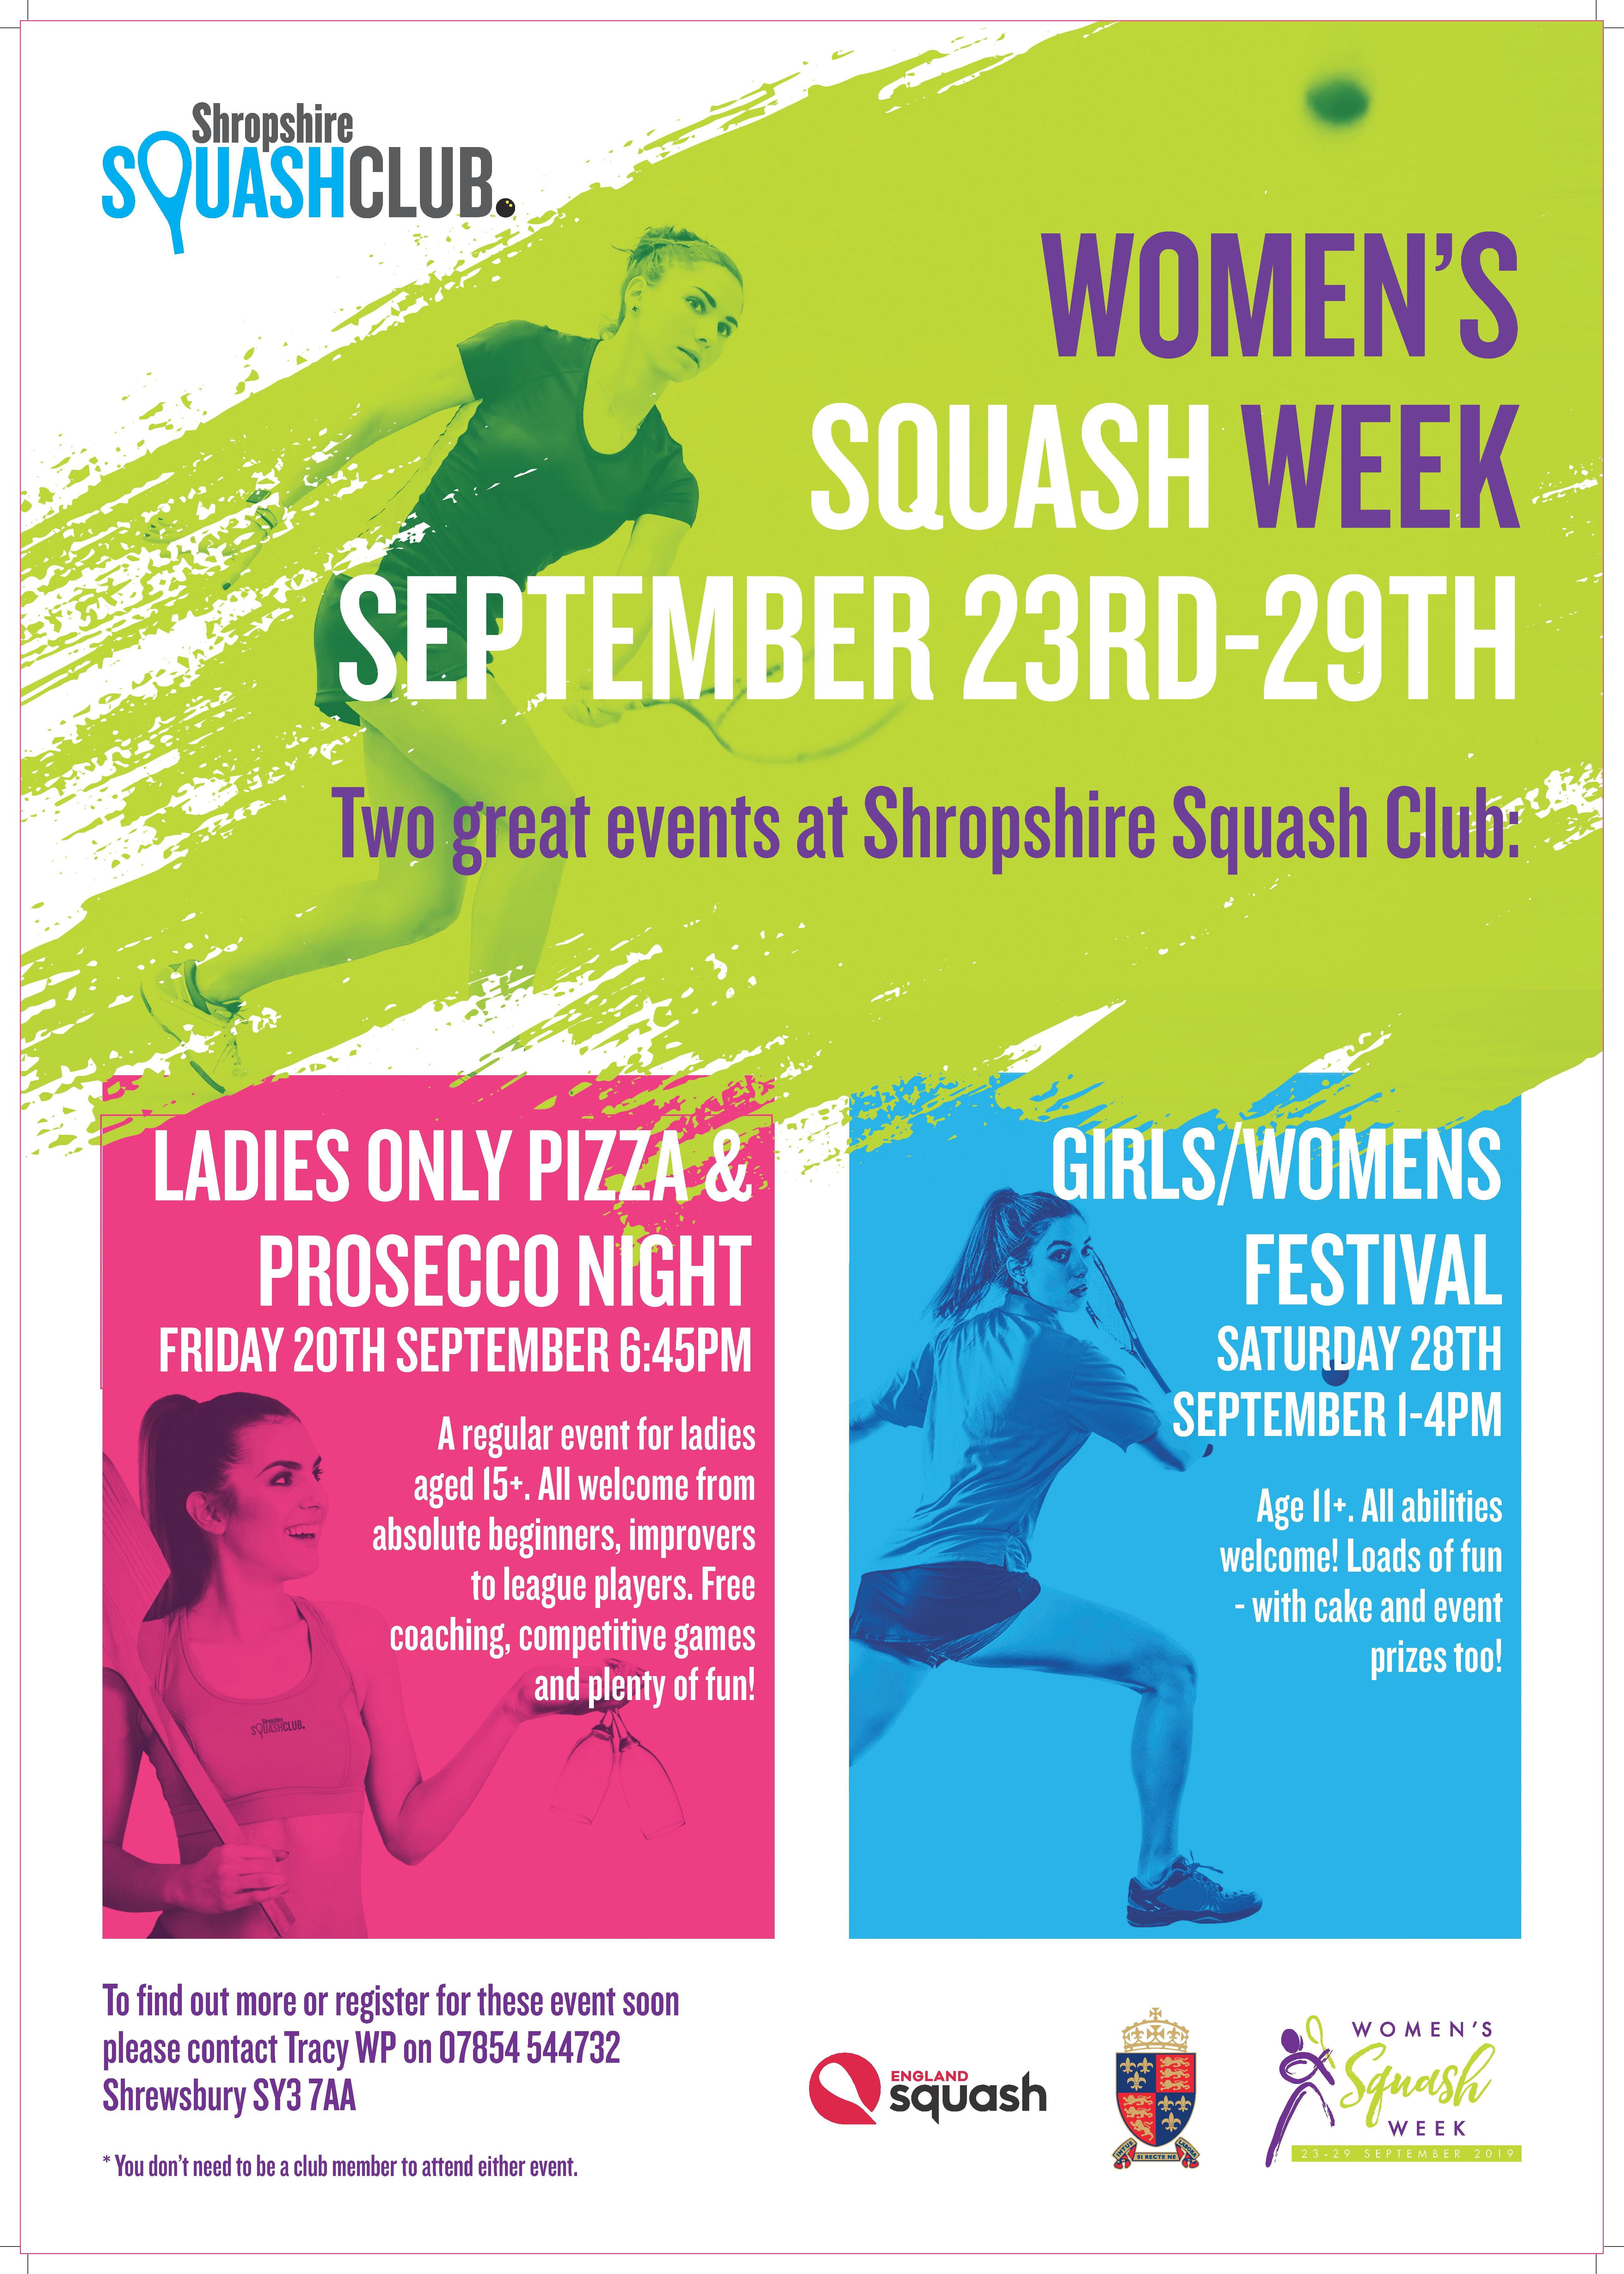 Int'l Women's Squash Week 2019